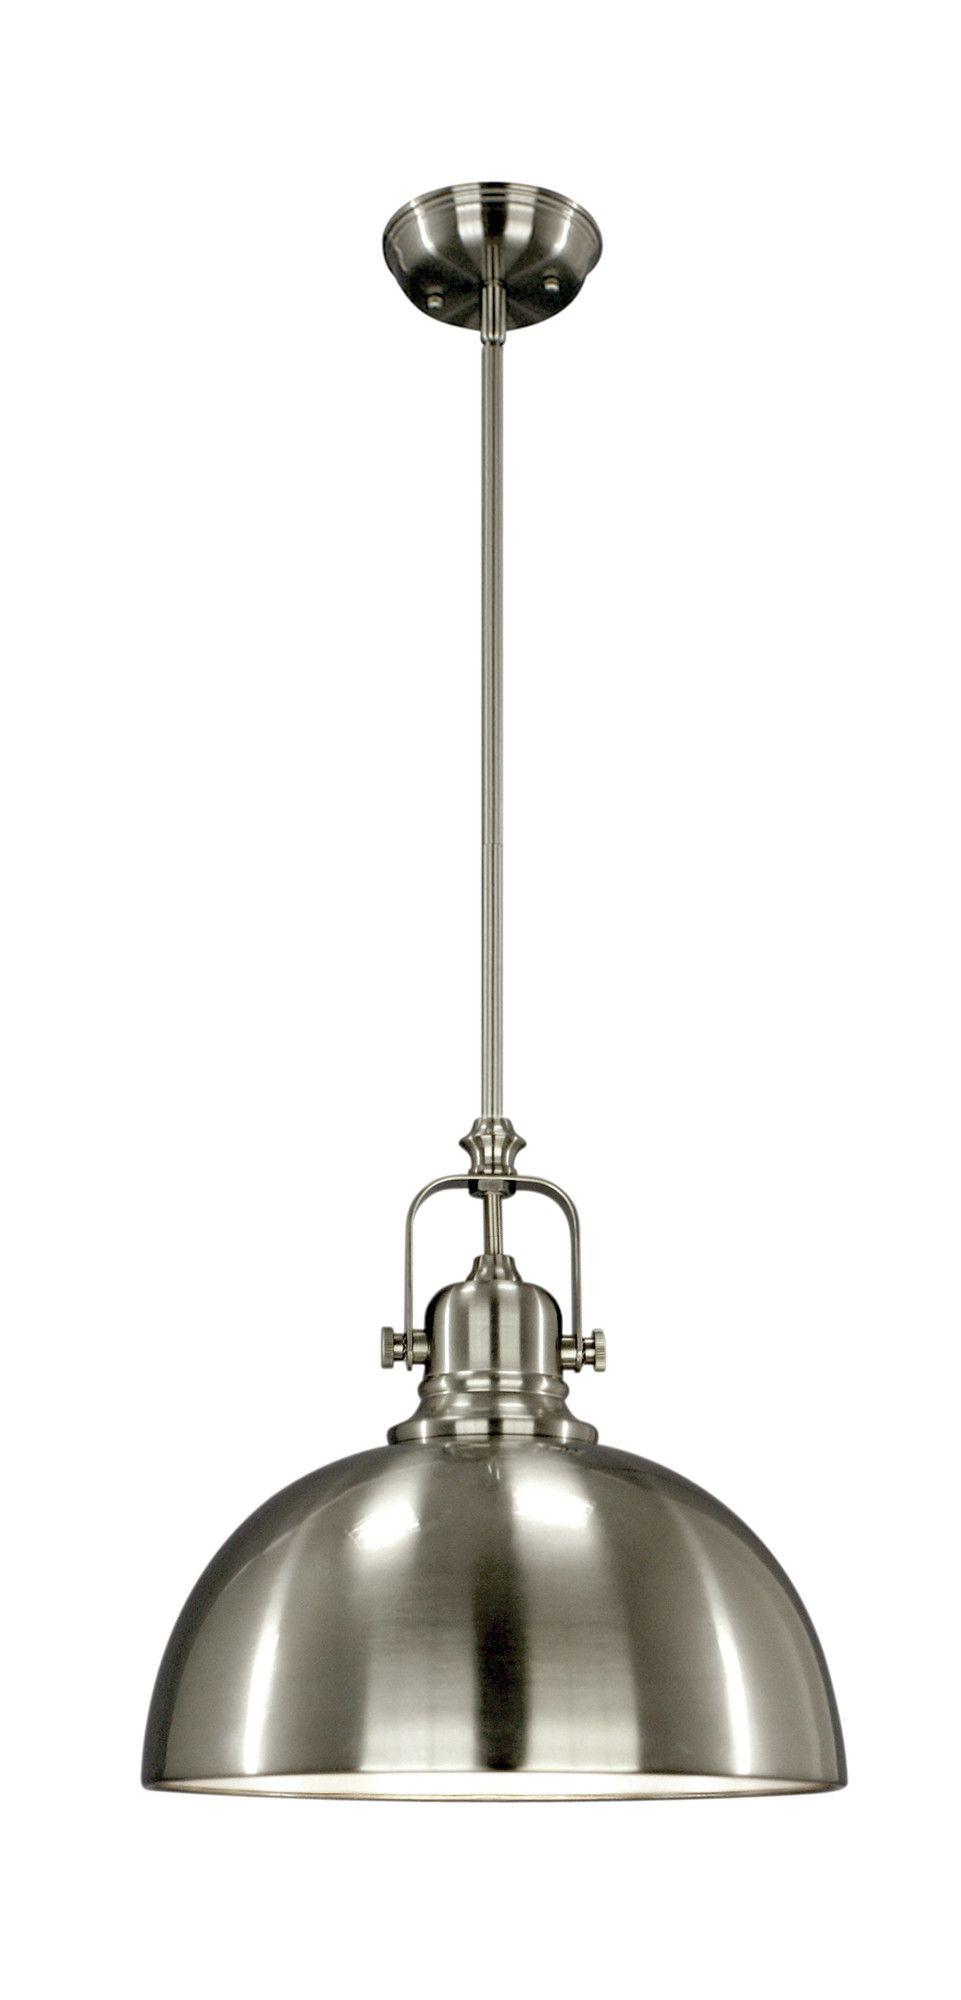 Industrial pendant light fixture in brushed nickel or ...